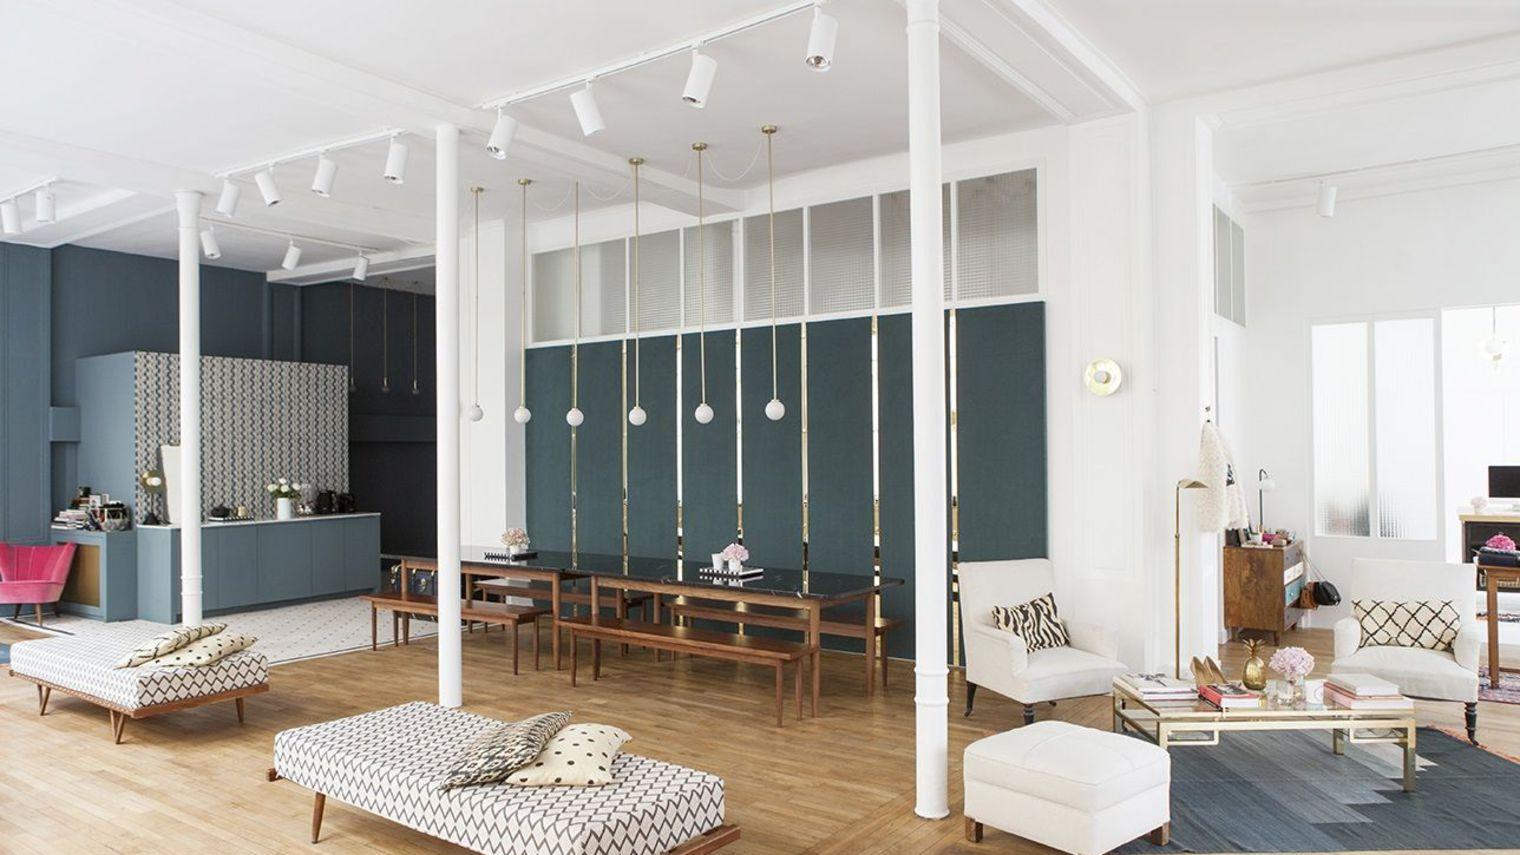 location appartement clermont ferrand une ville tr s. Black Bedroom Furniture Sets. Home Design Ideas